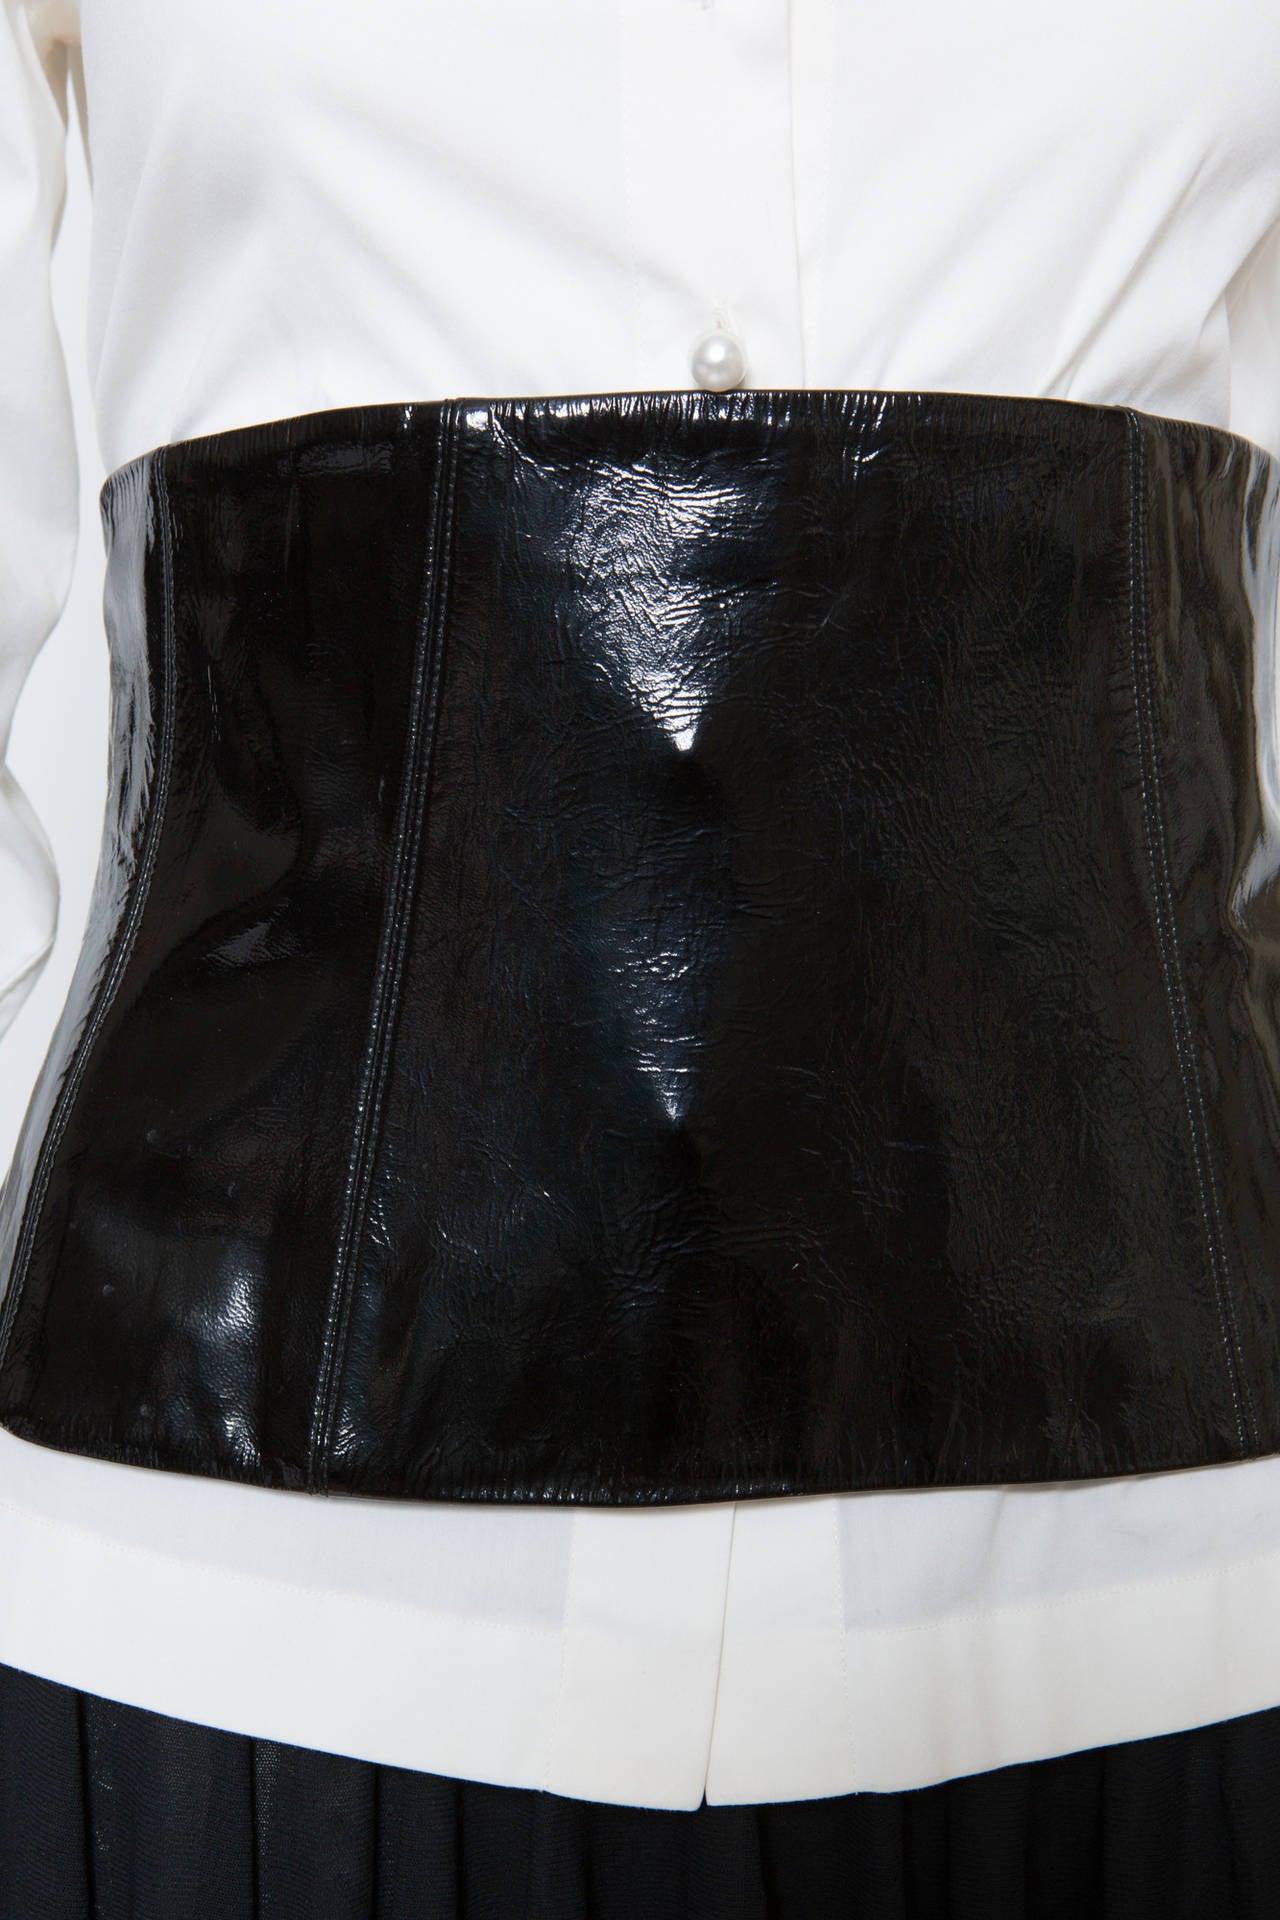 Chanel White Shirt With Black Vinyl Leather Corset Belt 8